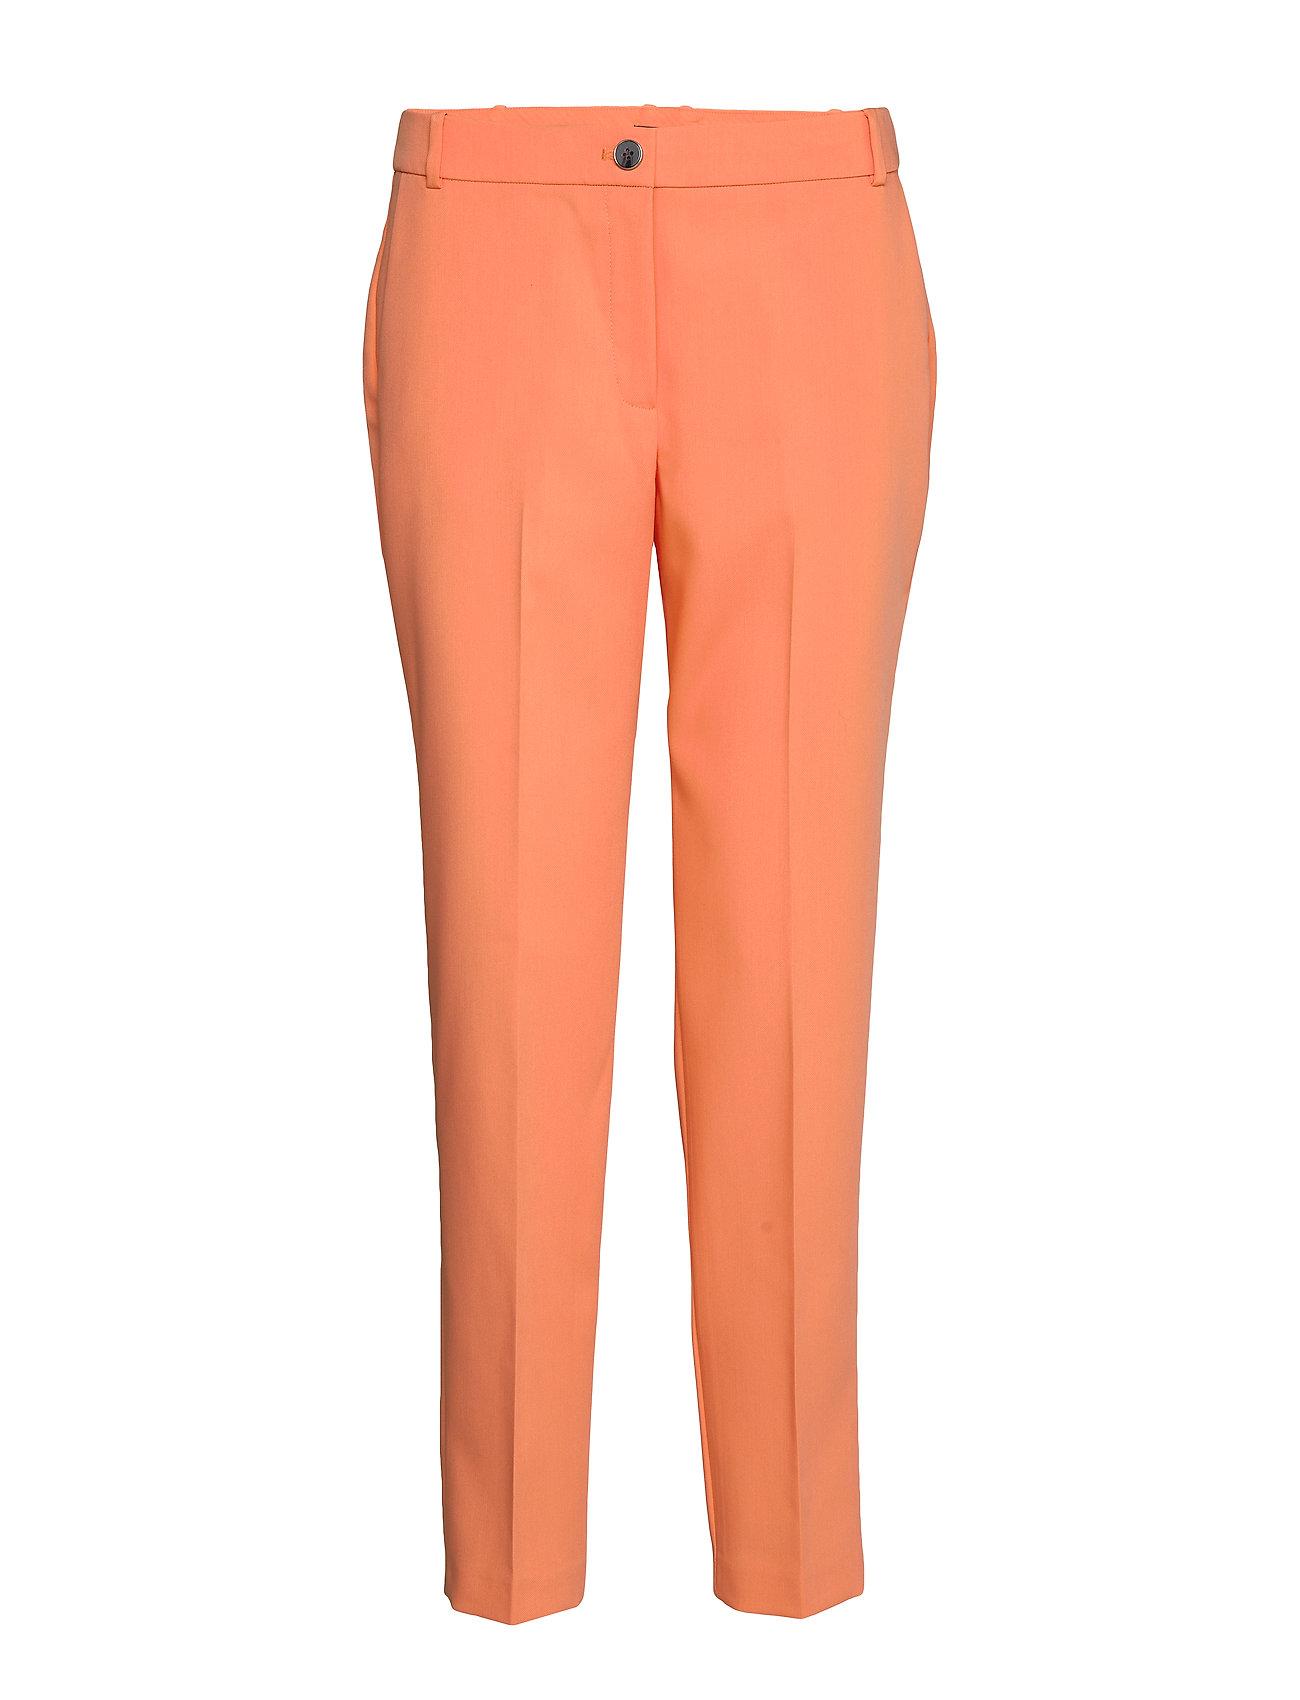 Esprit Collection Pants woven - PEACH